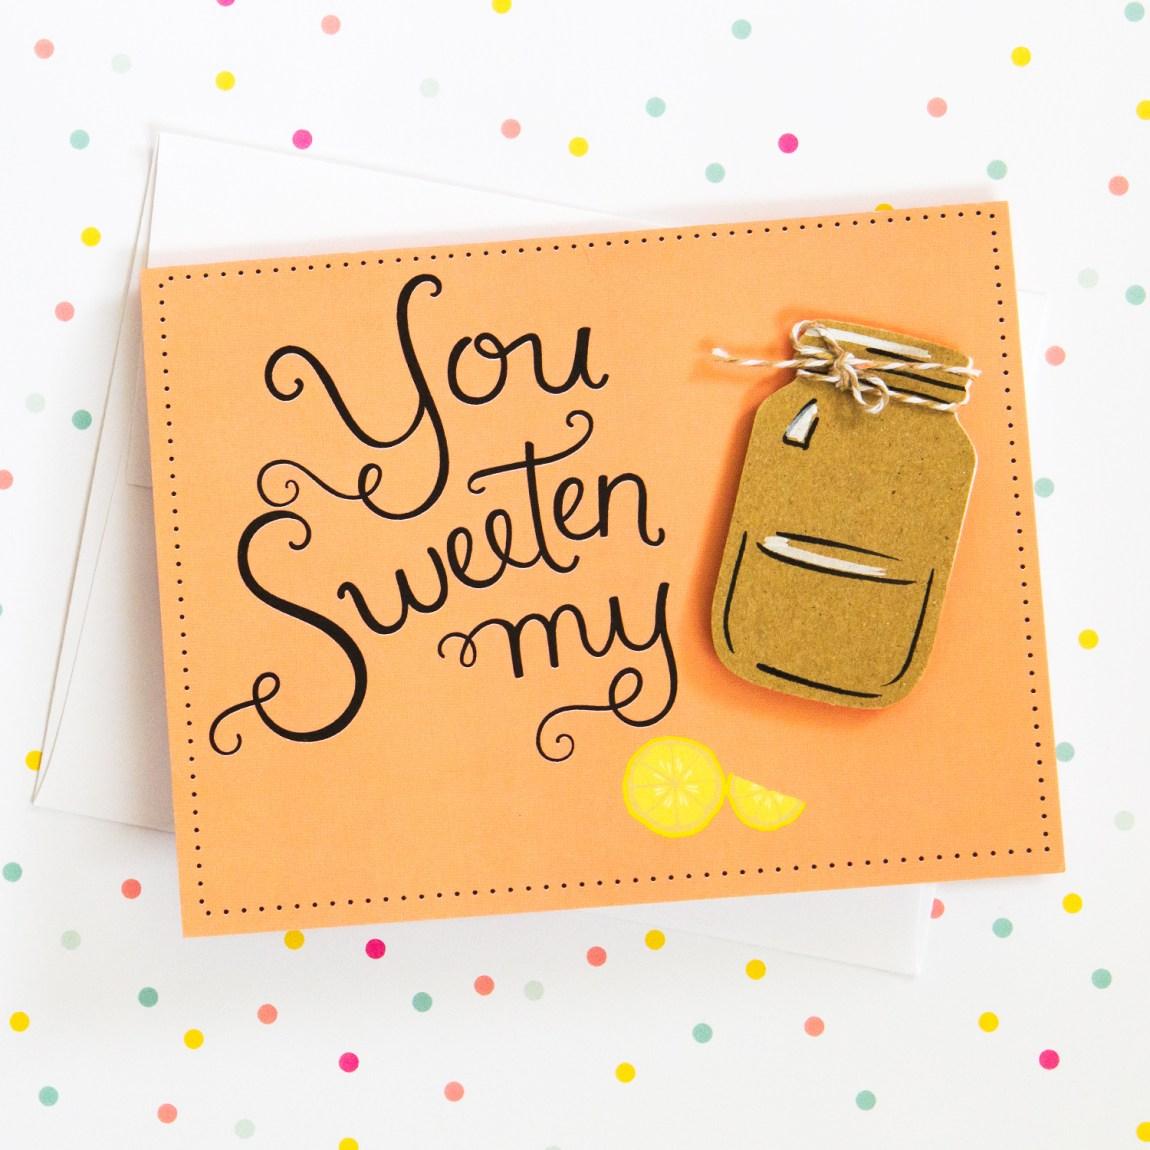 You Sweeten My Tea! Cute card by Handmade Darling